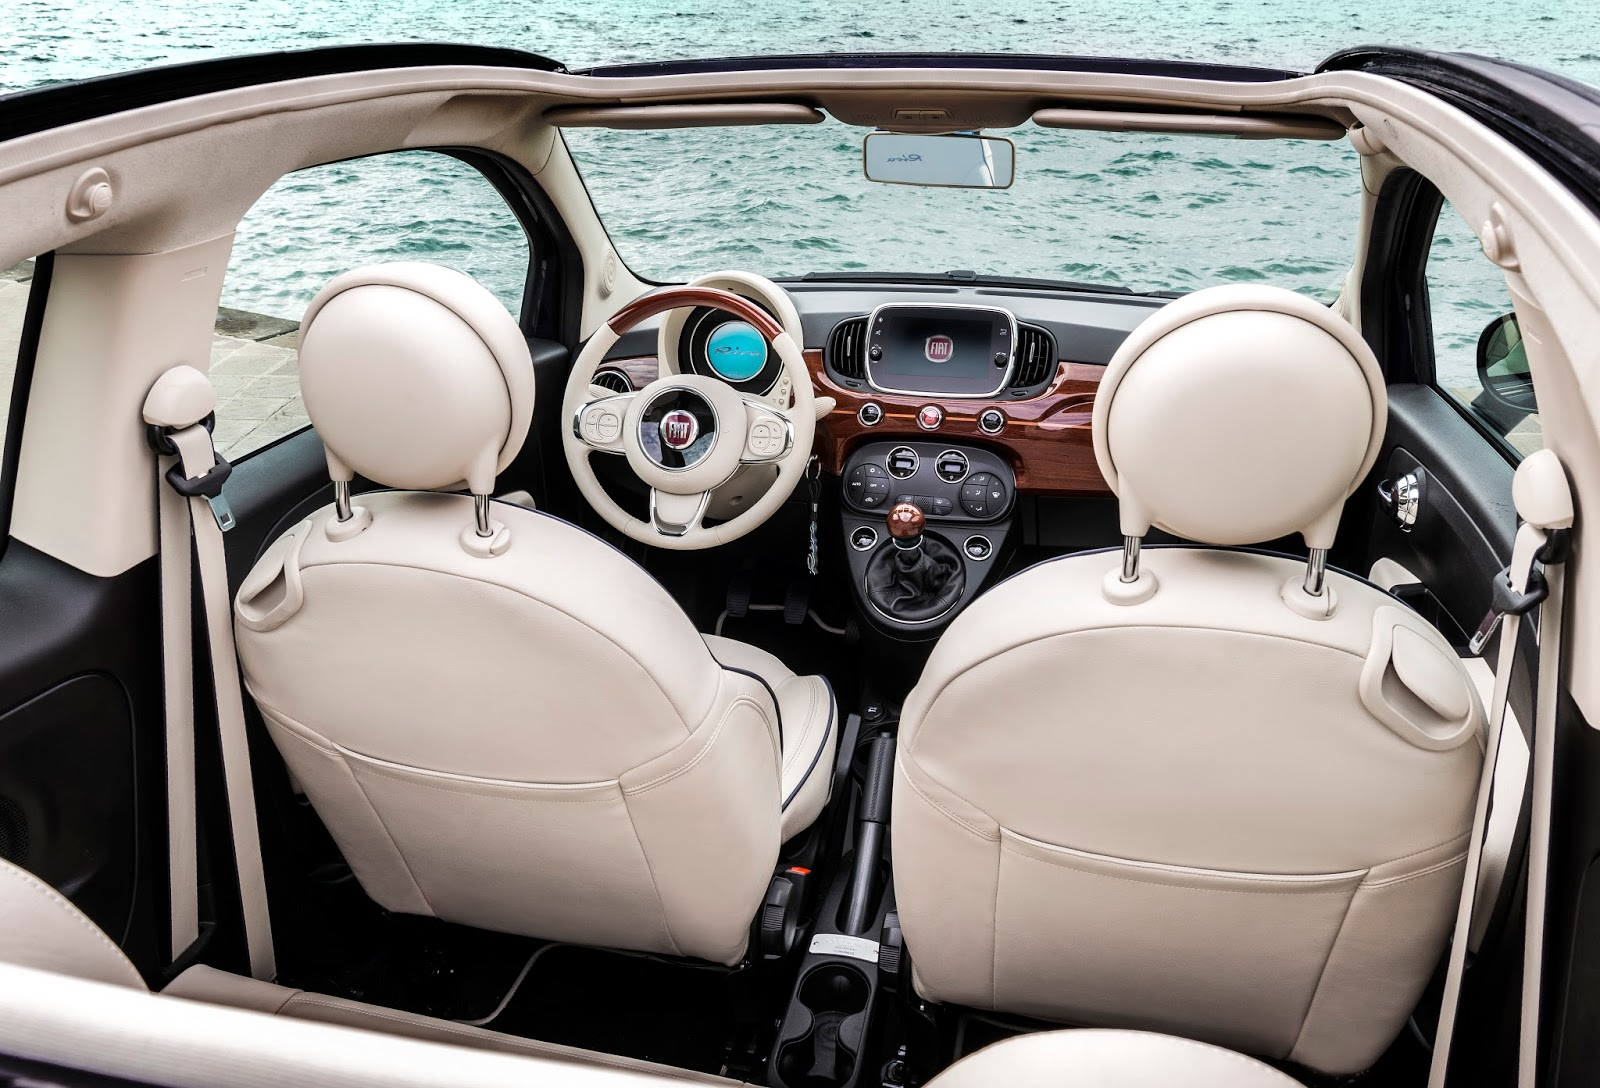 160627 Fiat 500 Riva 15 Fiat 500 Riva : Το κομψό έγινε και πολυτελές Fiat, Fiat 500, Fiat 500 Riva, Fiat 500C, Riva, supermini, videos